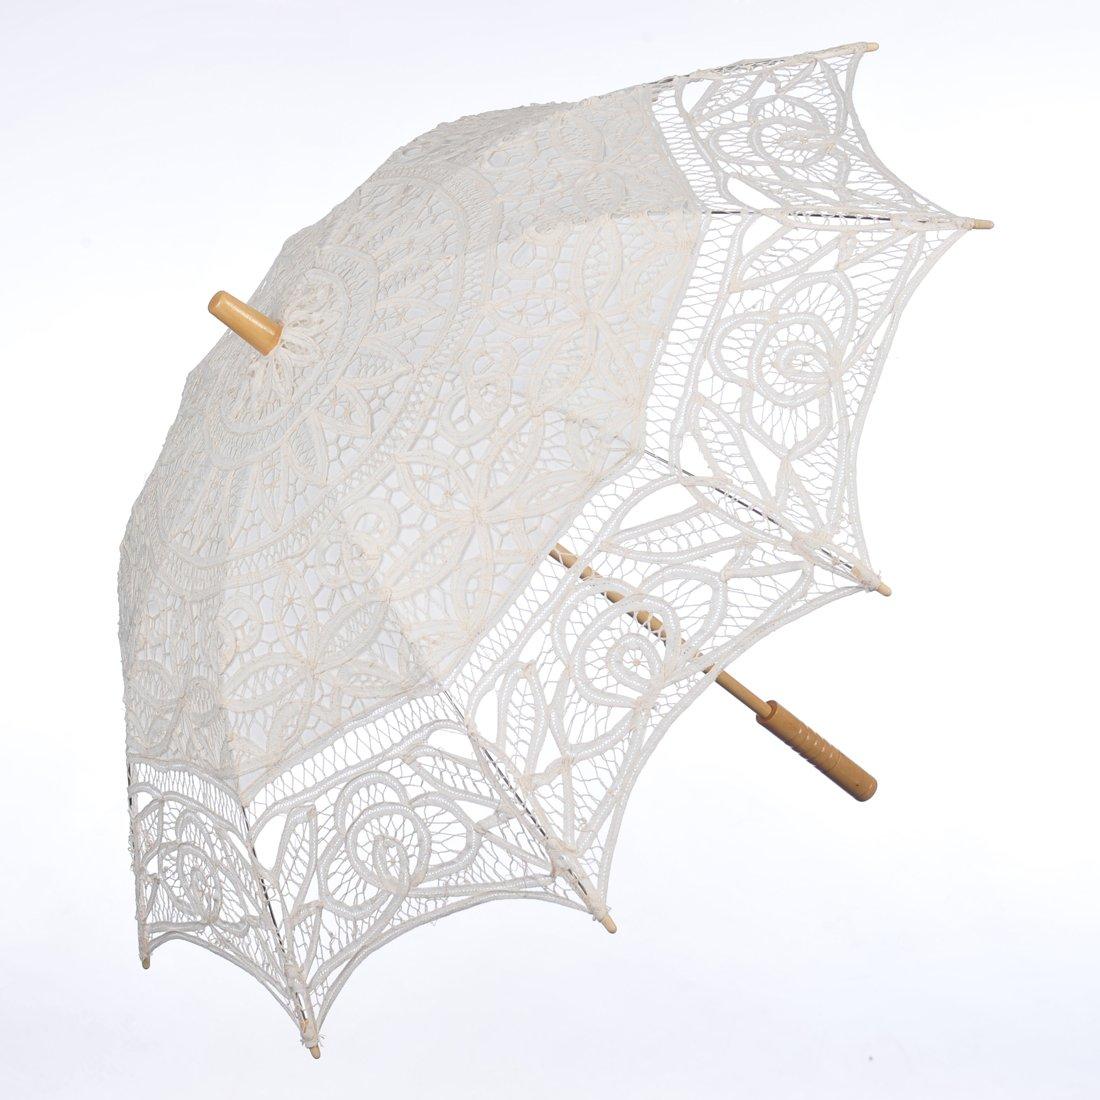 Topwedding Battenburg Lace Outdoor Wedding Parasol Bridal Shower Umbrella, Beige